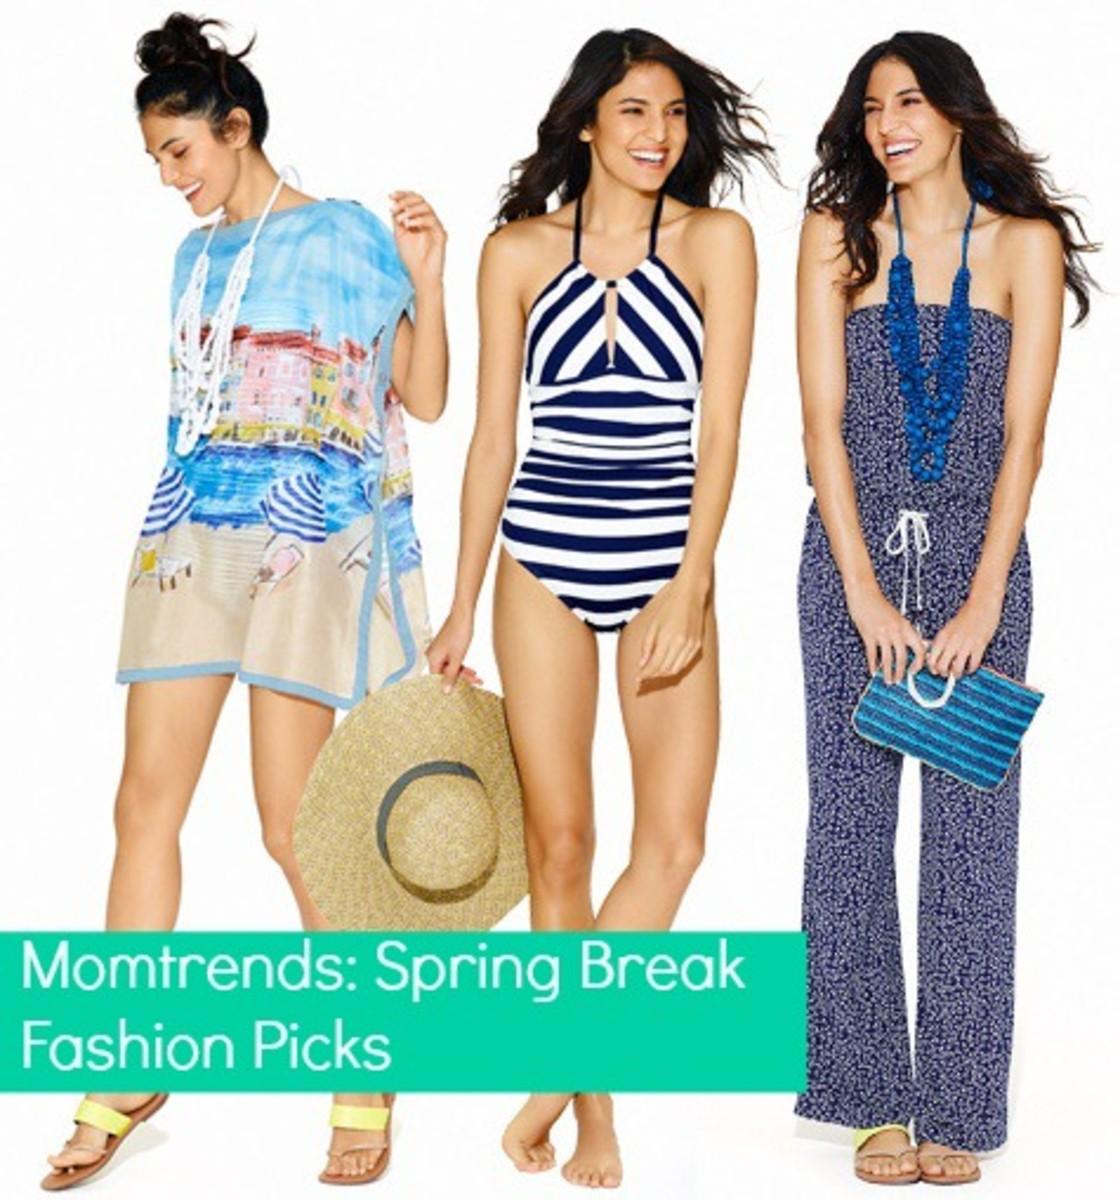 Spring Break Fashions from LOFT